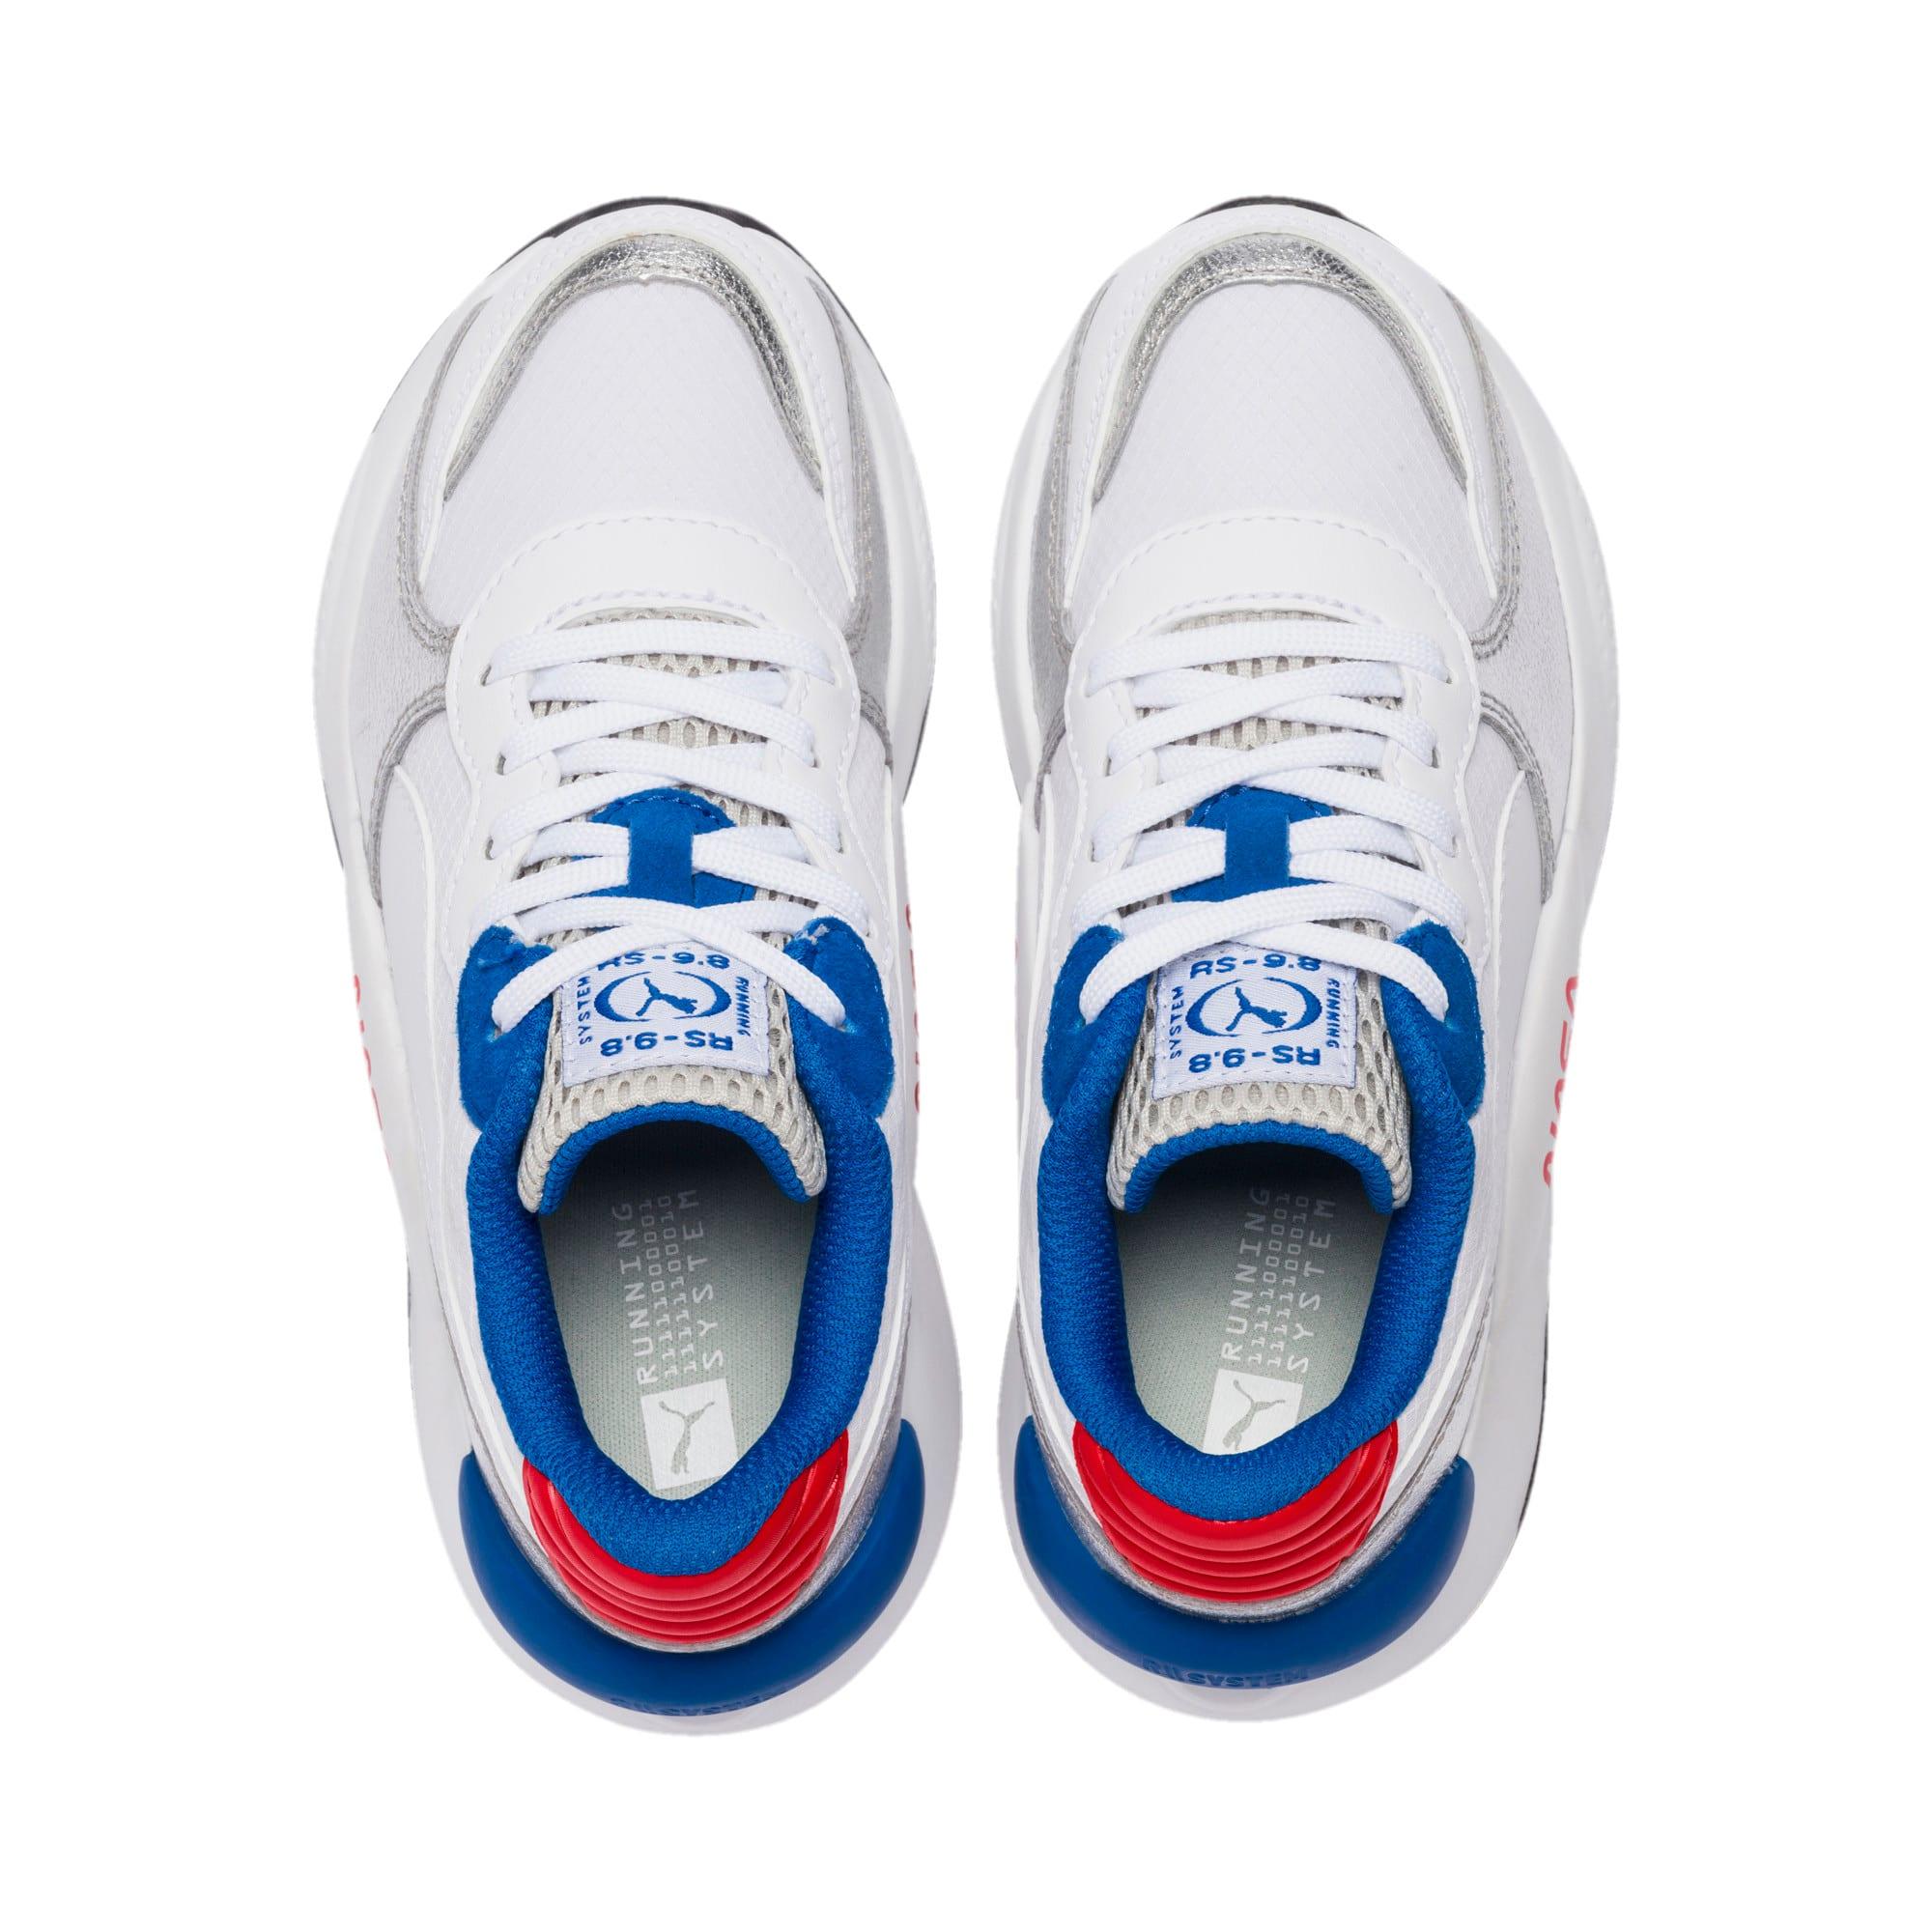 Thumbnail 6 of RS 9.8 Space Agency Little Kids' Shoes, Puma White-Puma Silver, medium